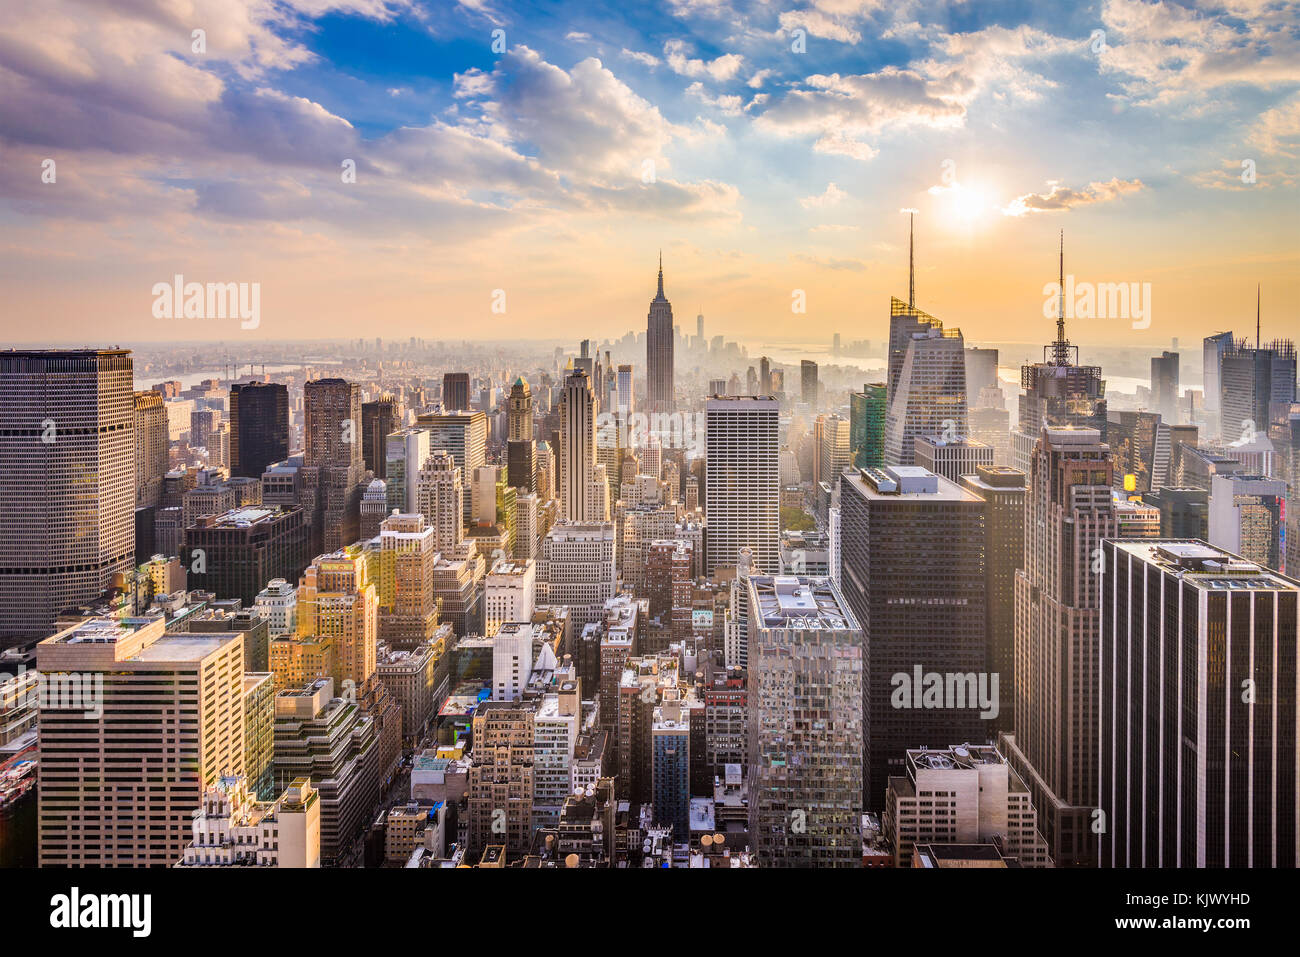 New York, New York, États-Unis d'horizon. Photo Stock